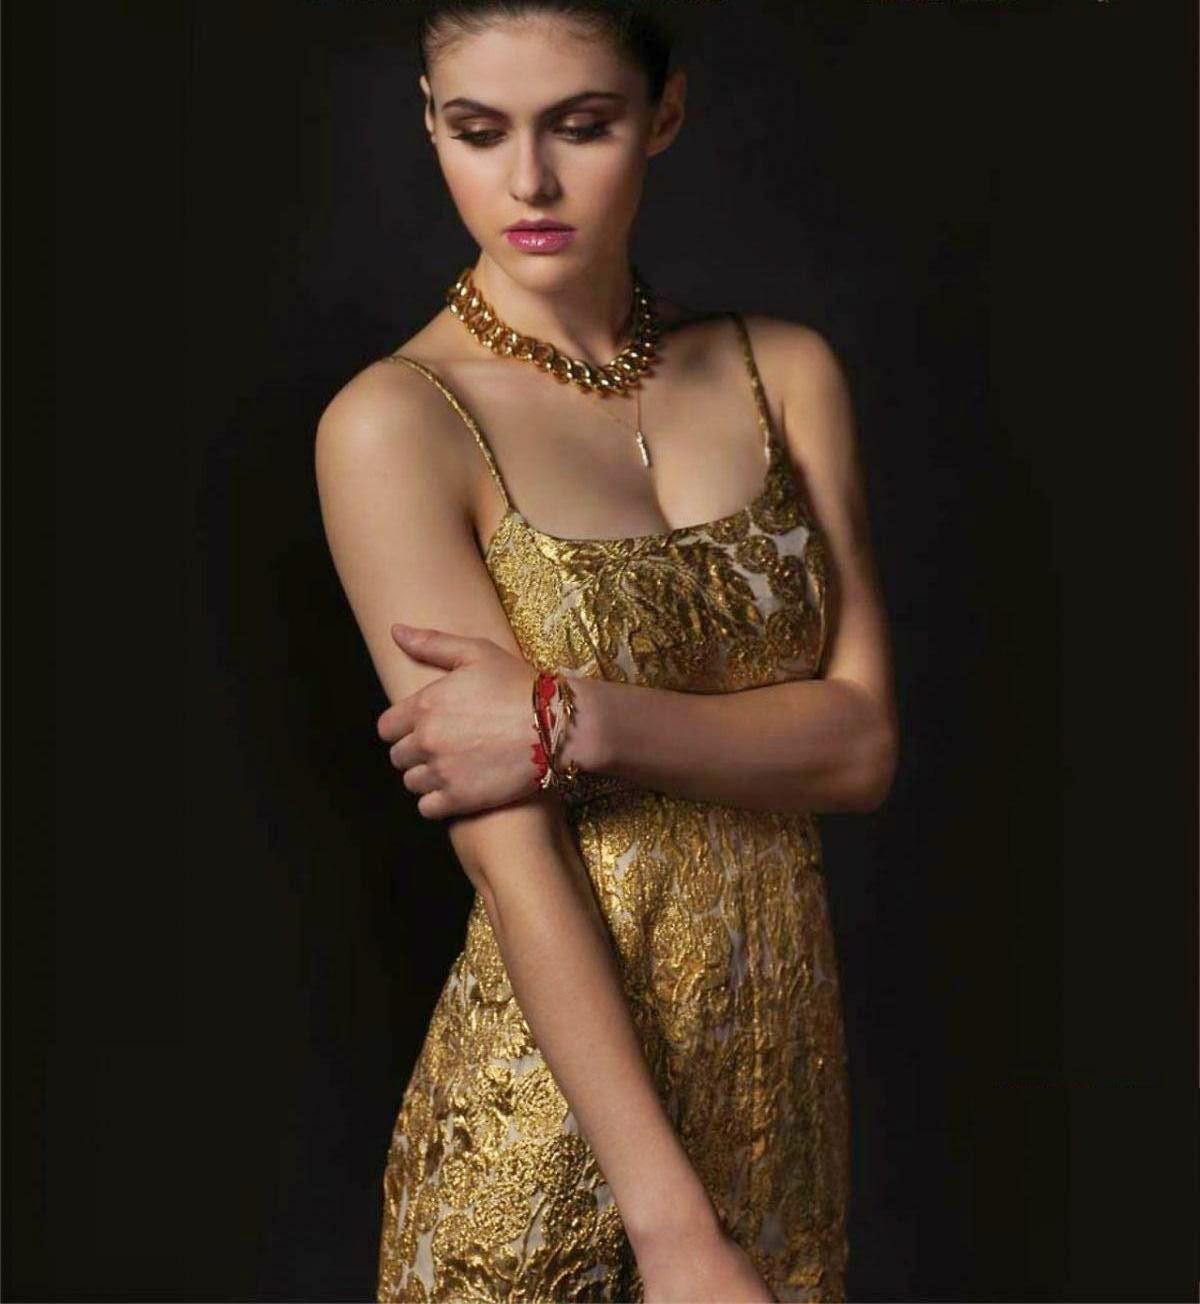 Hollywood Actress Wallpaper: Alexandra Daddario Wallpapers